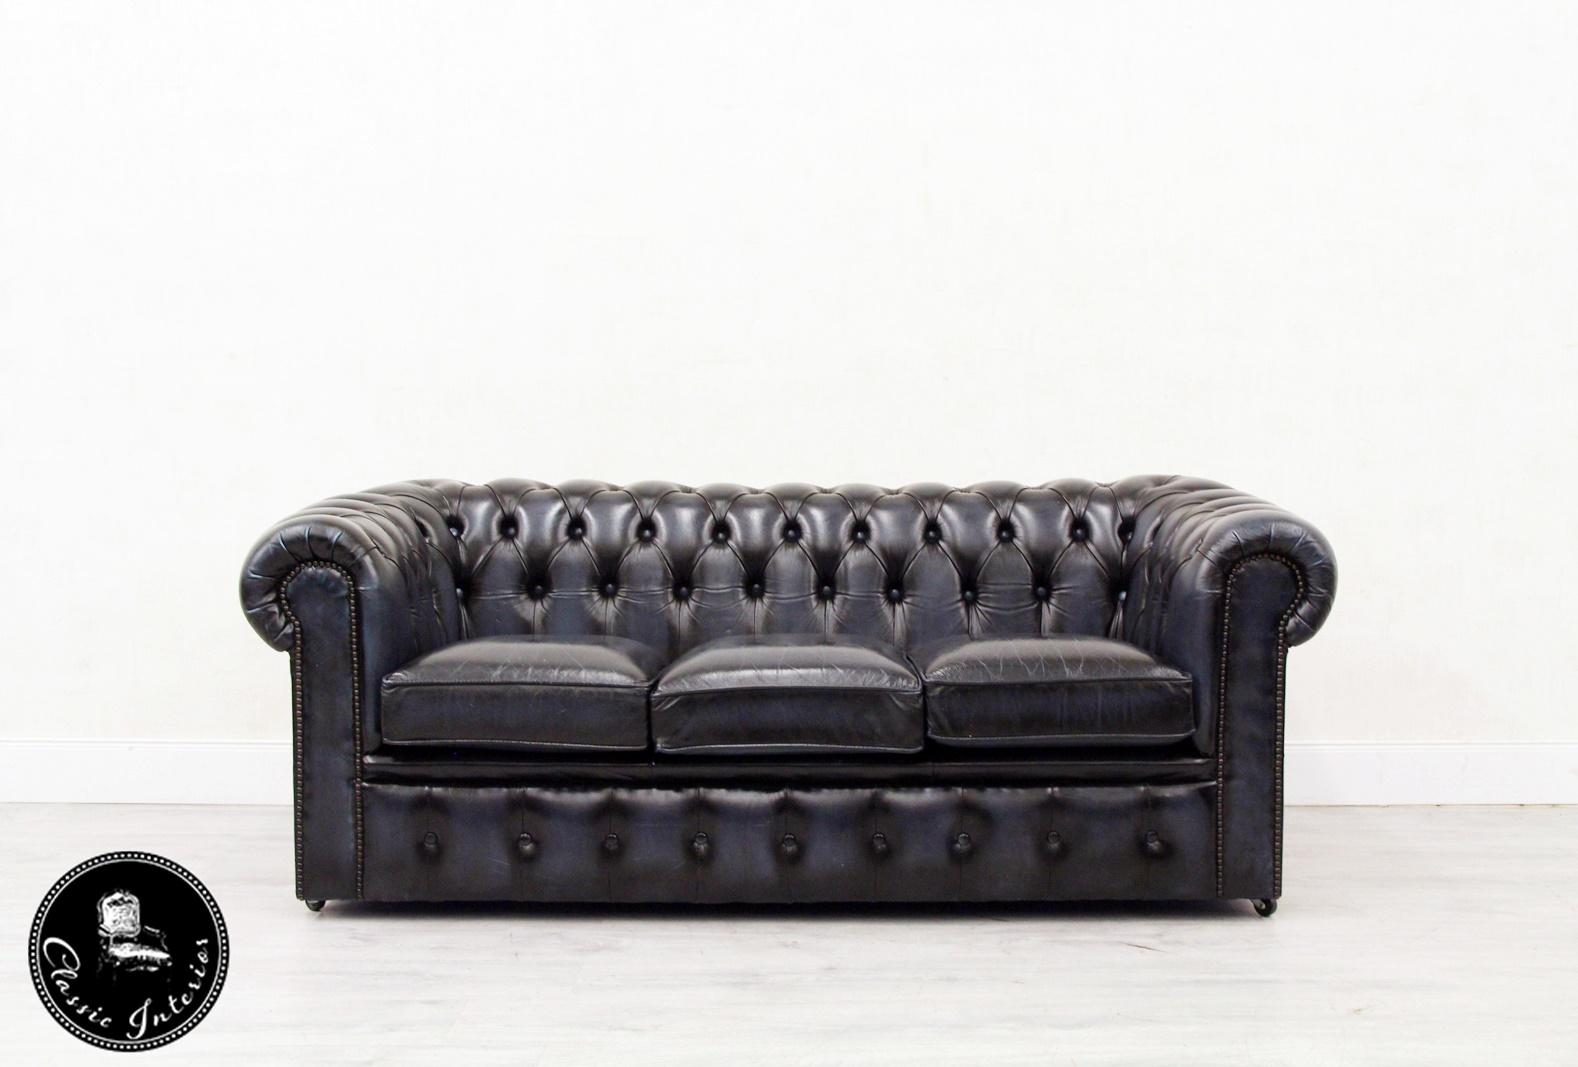 Full Size of Sofa Englisch Chesterfield 2 Er Leder Couch Ledersofa Ebay Günstig Kaufen Echtleder Rolf Benz Altes Leinen Bullfrog Xora Modulares U Form Xxl Kunstleder Ewald Sofa Sofa Englisch